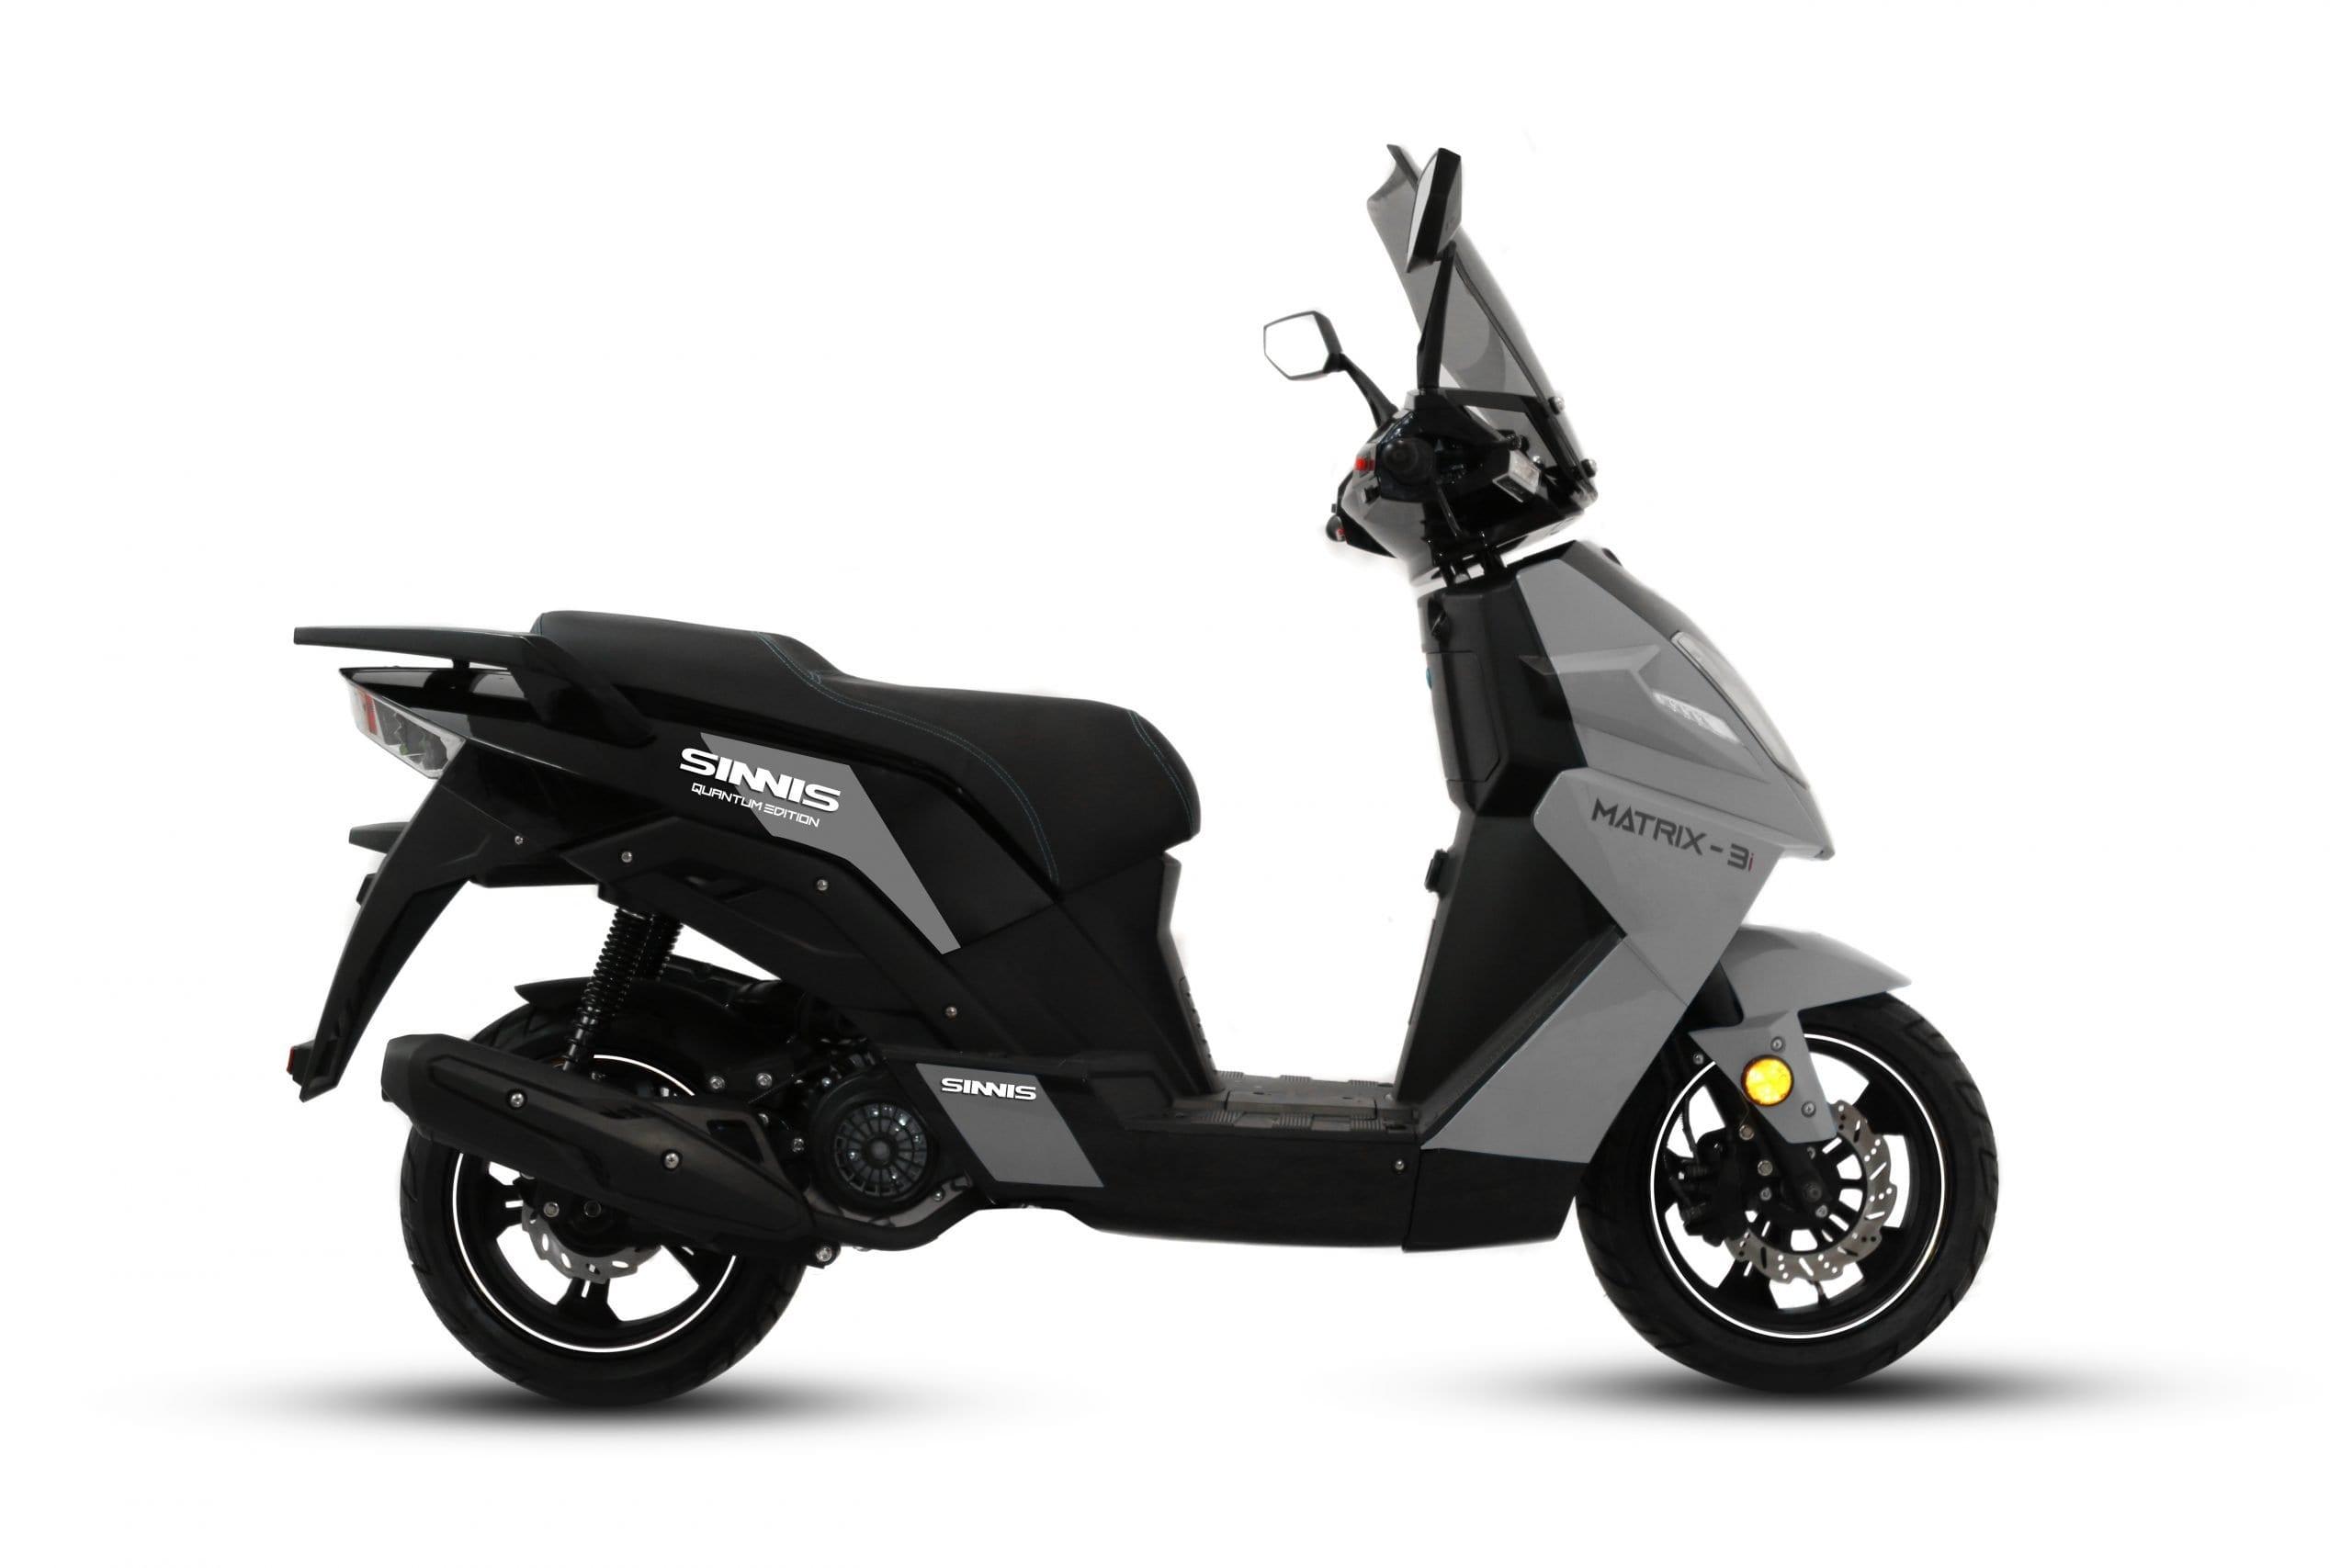 Sinnis Matrix grey 125cc scooter